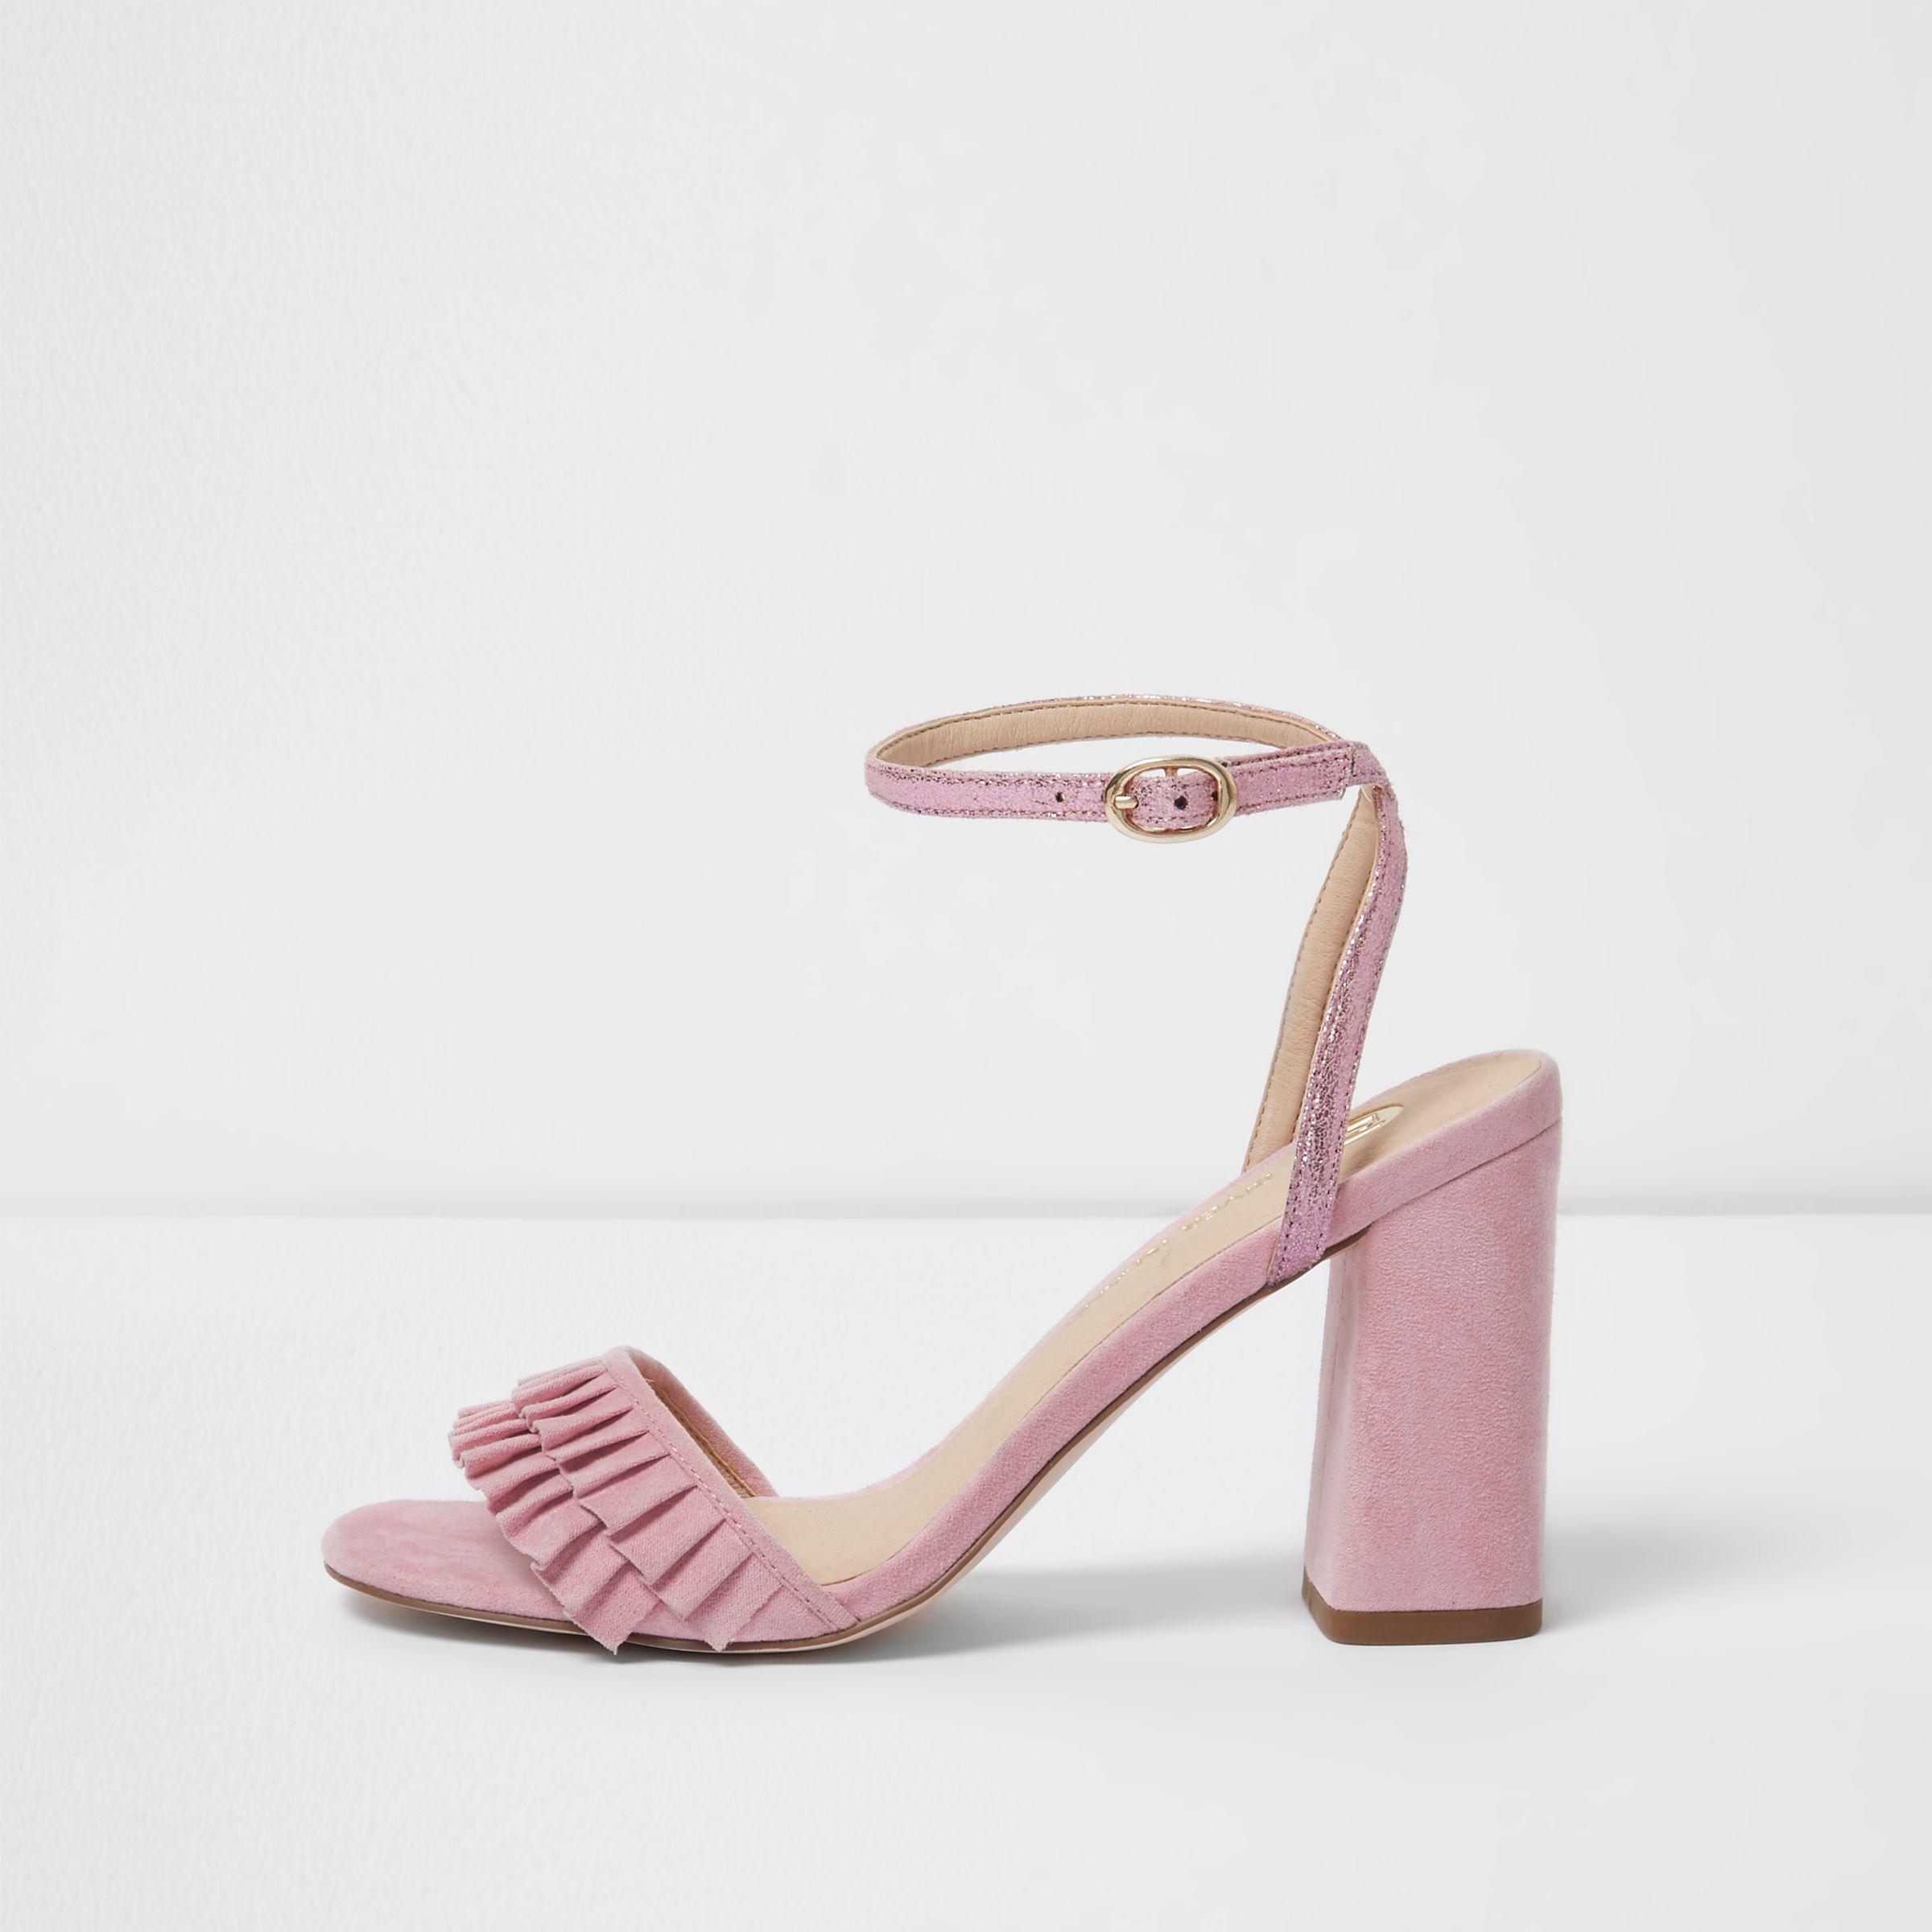 acbe3b4336a Women's Pink Frill Strap Block Heel Sandals